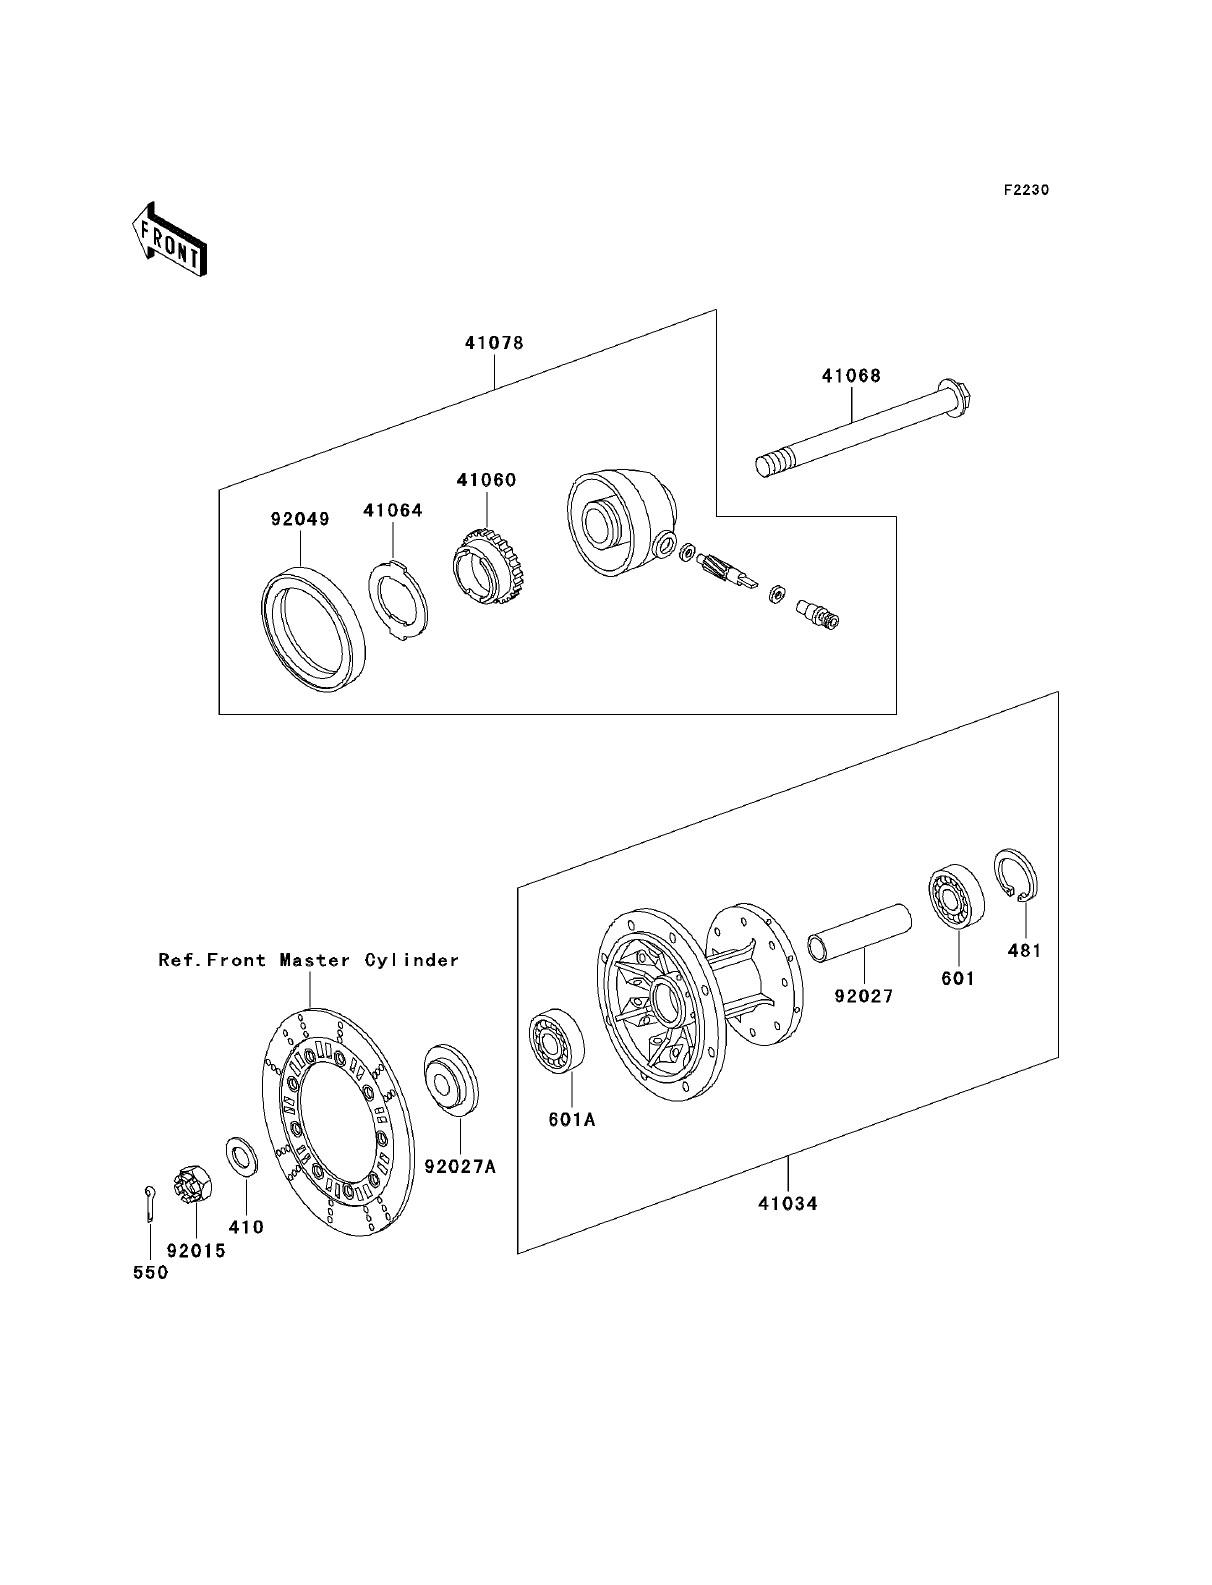 Rear Brake Drum Assembly Diagram